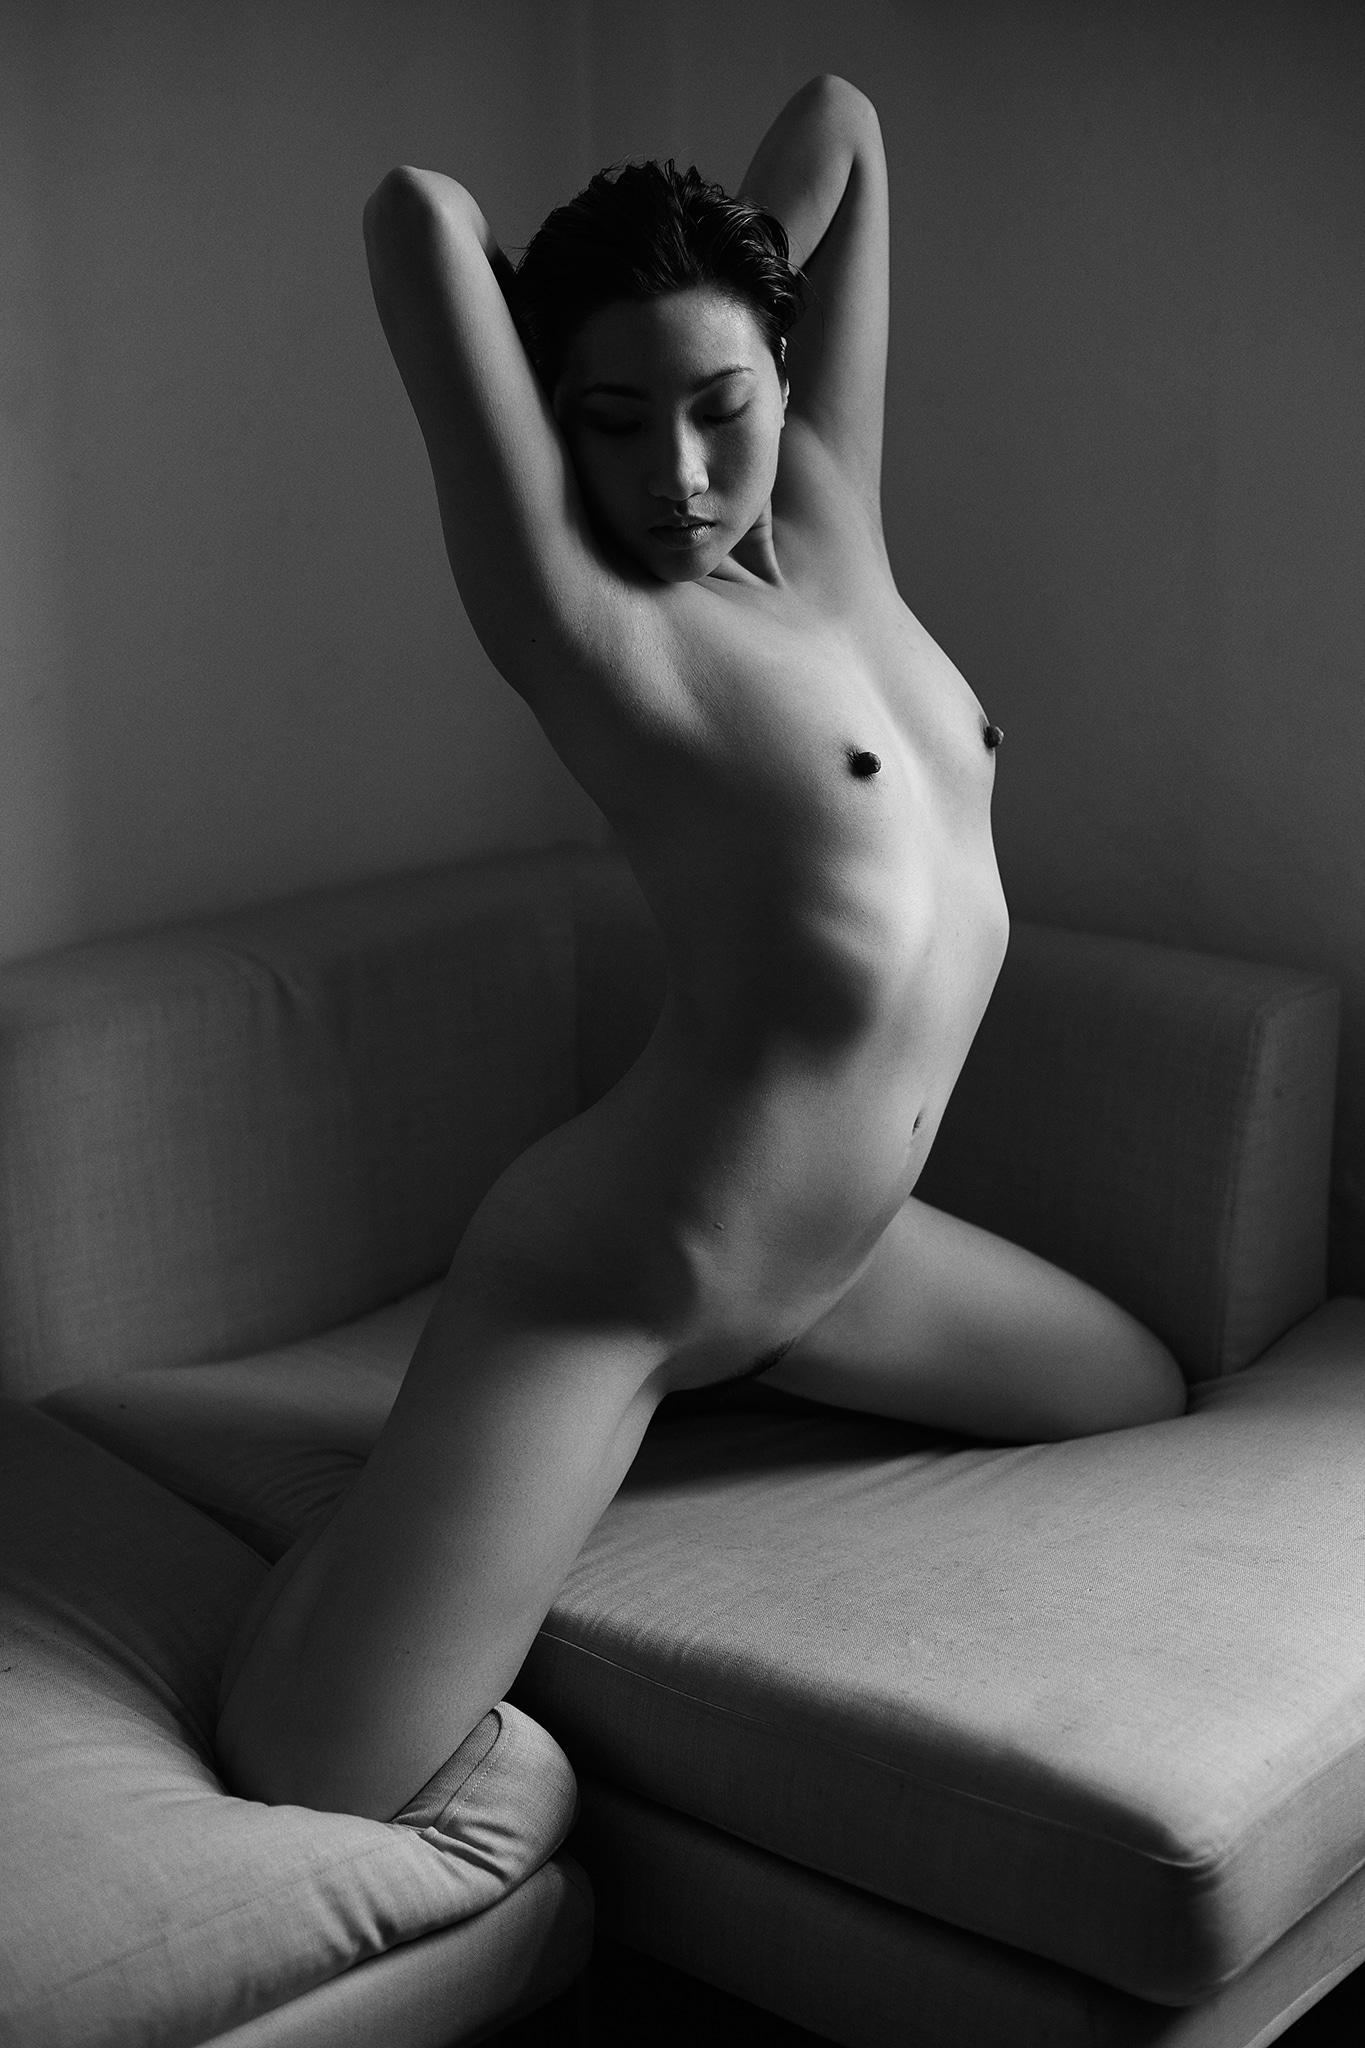 Artistic Nude Image